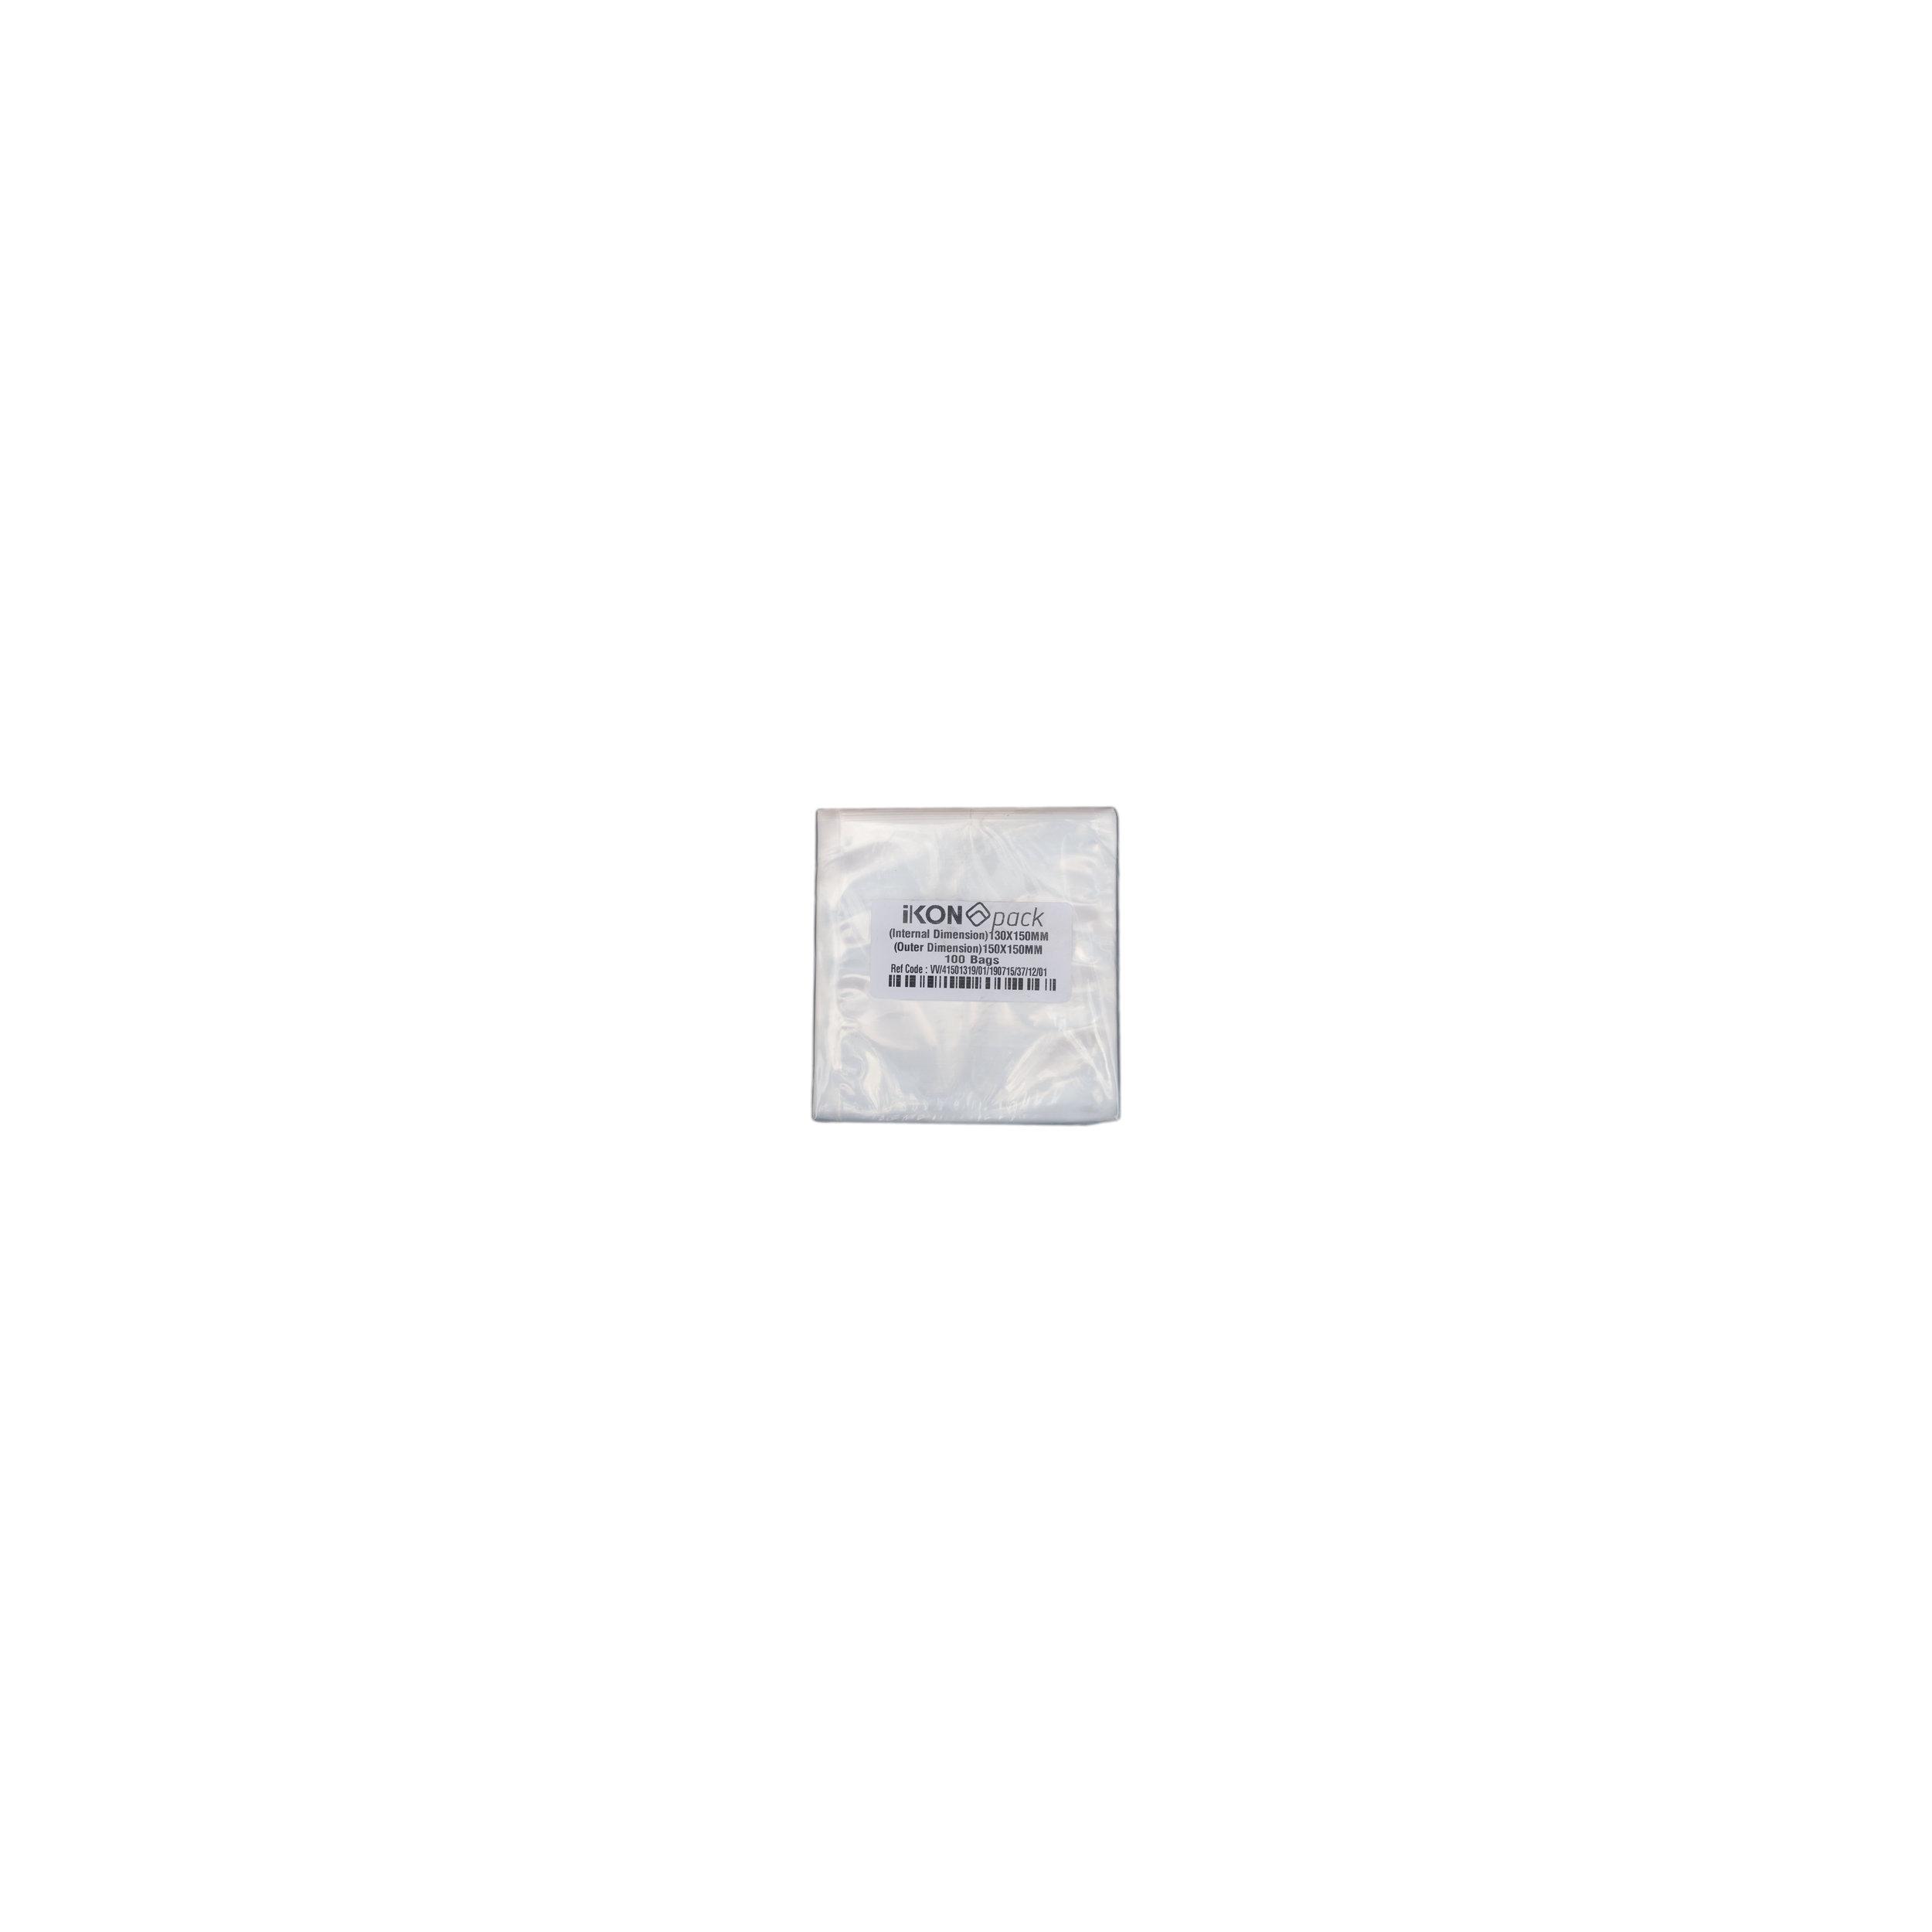 iK-VAC1315      VACUUM POUCH 70 MICRON 130X150    100 per slv 1000 per carton